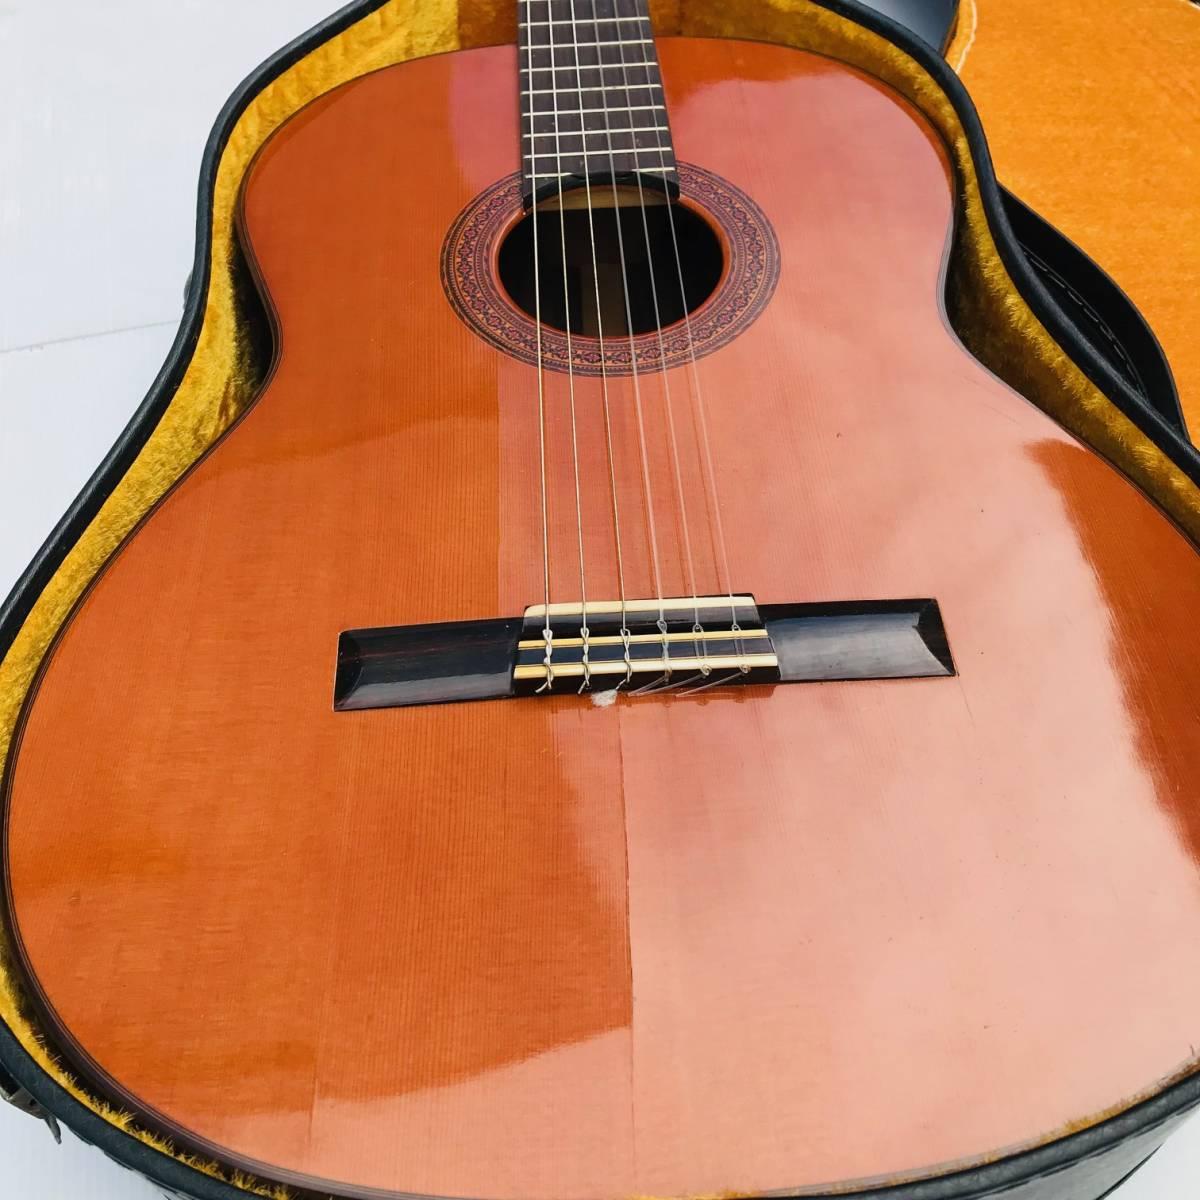 RYOJI MATSUOKA 松岡良治 ギター LUTHIER NO.25 1972年 NAGOYA JAPON クラシックギター ハードケース付【現状品】_画像3